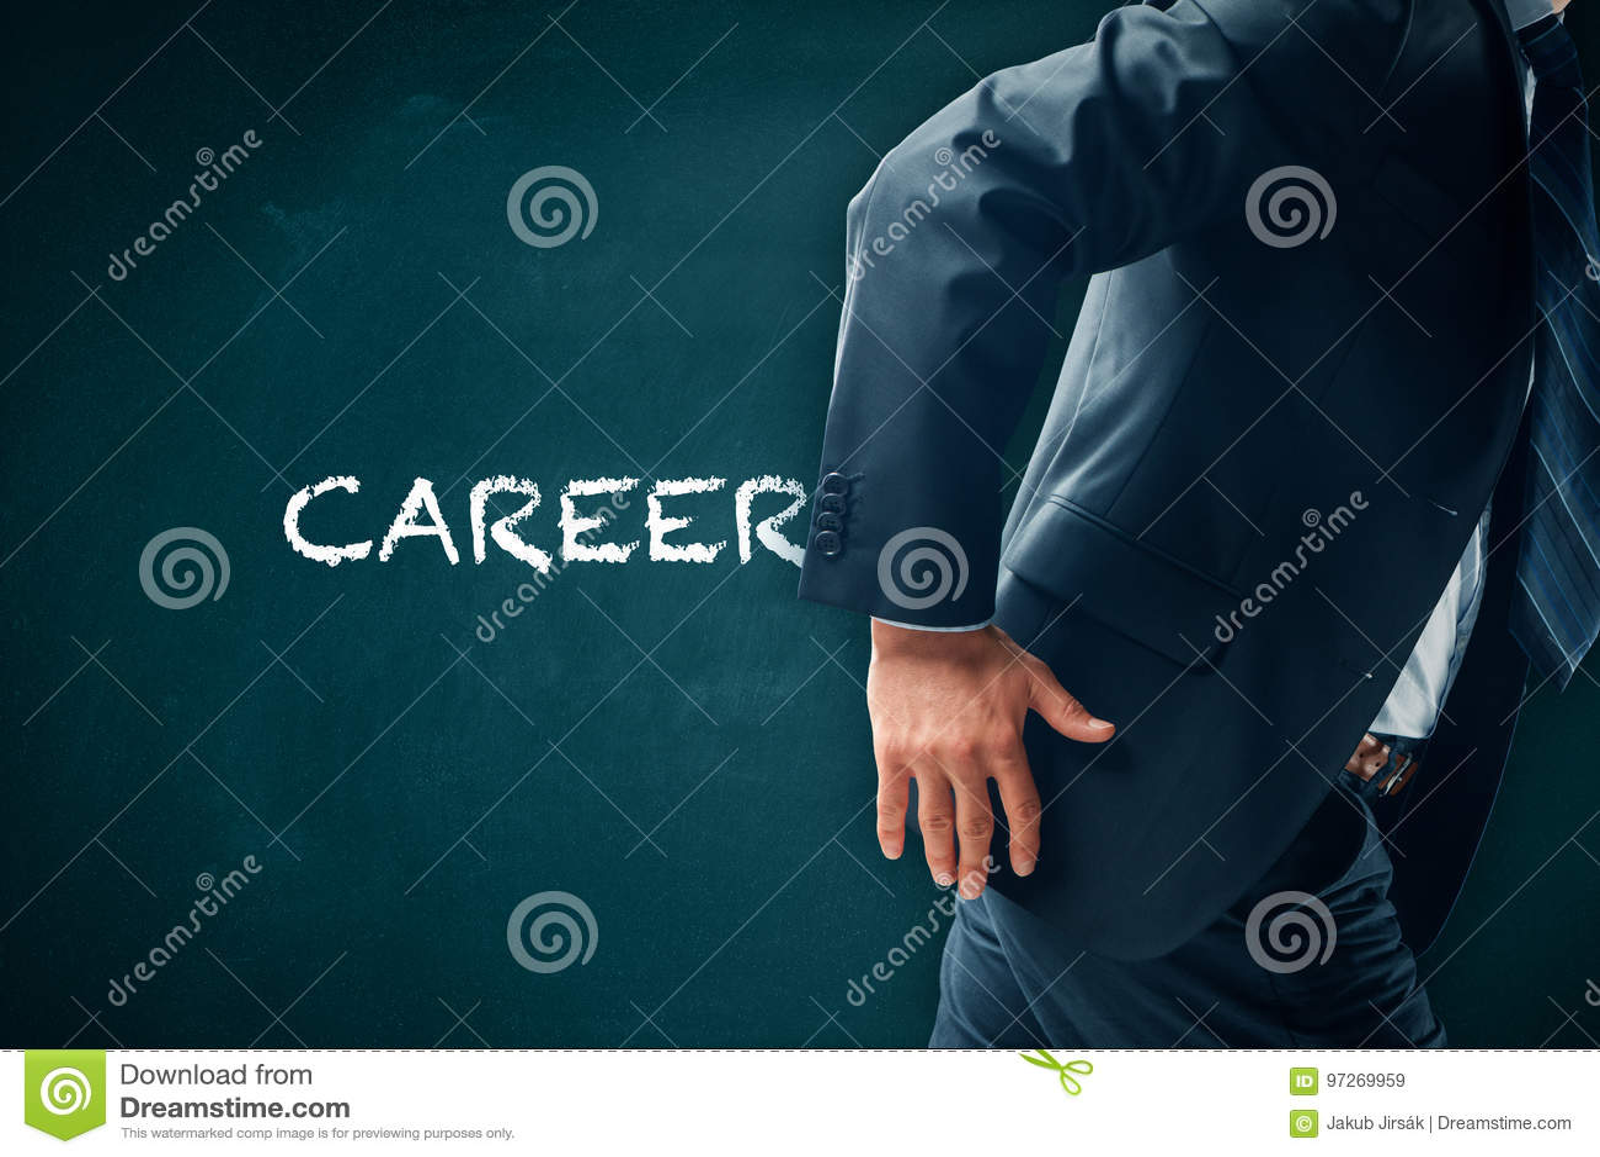 Career acceleration